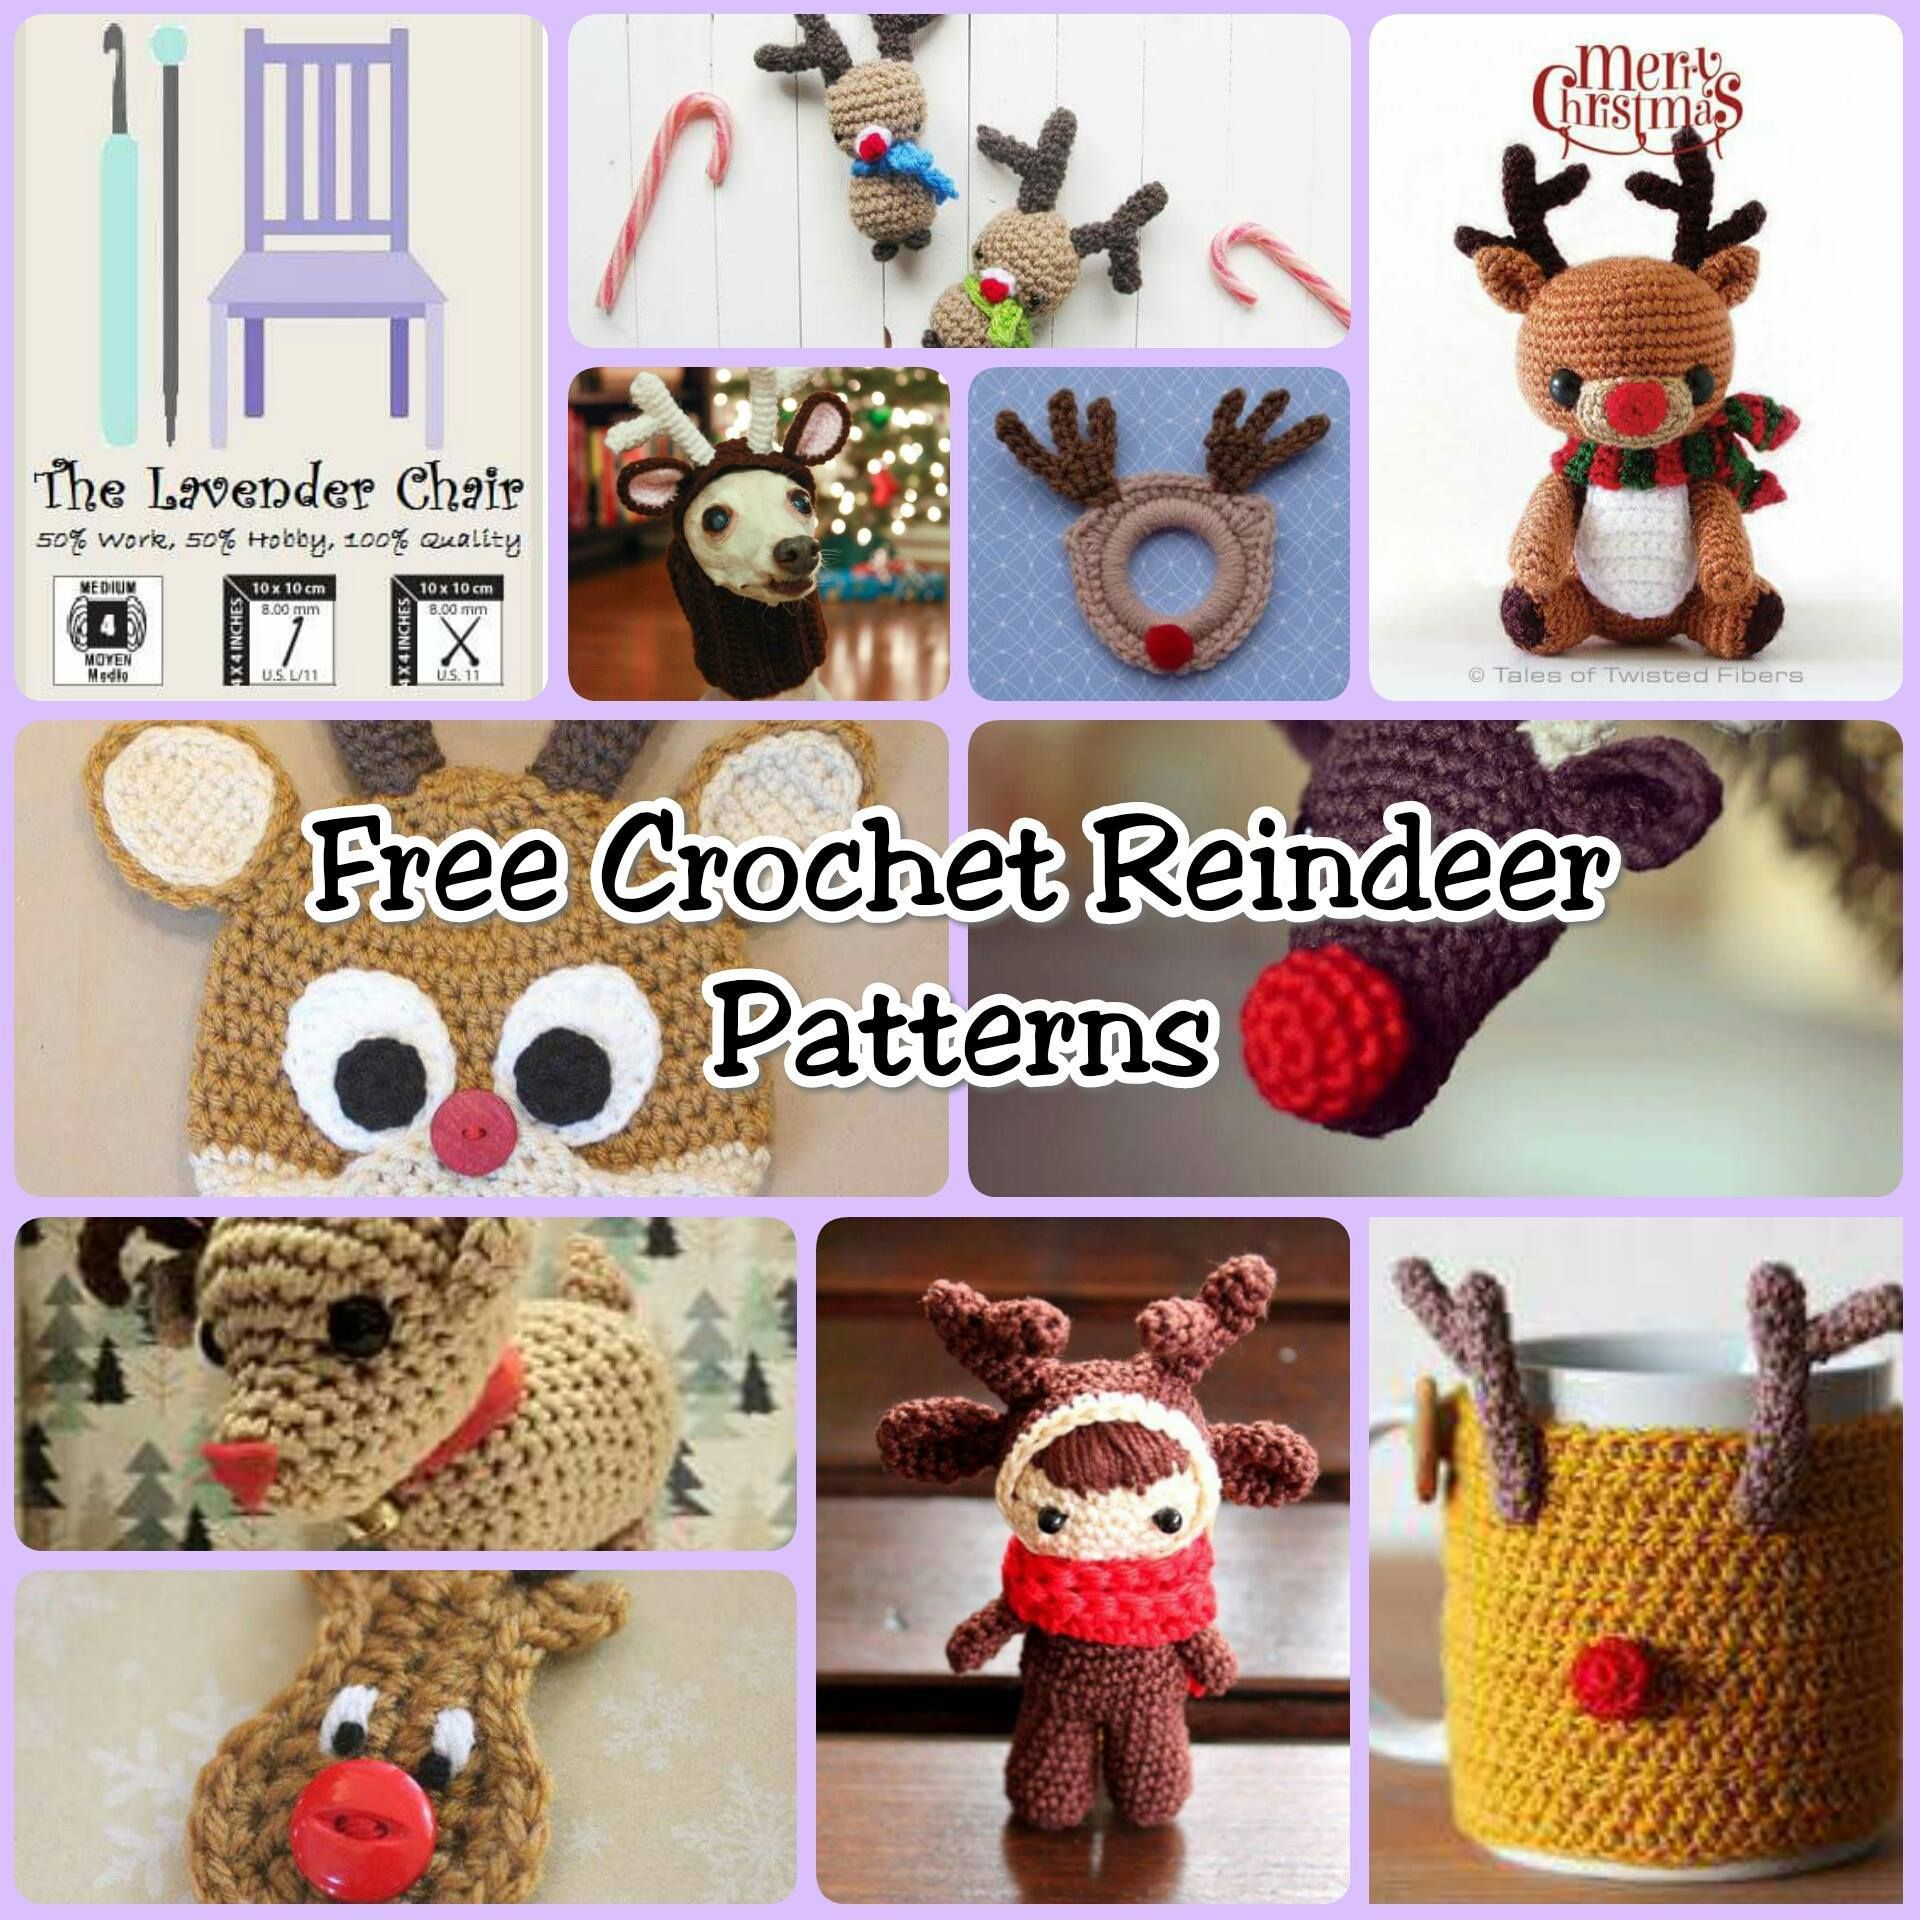 150+ FREE Christmas Crochet Patterns | Lavender, Crochet and Patterns